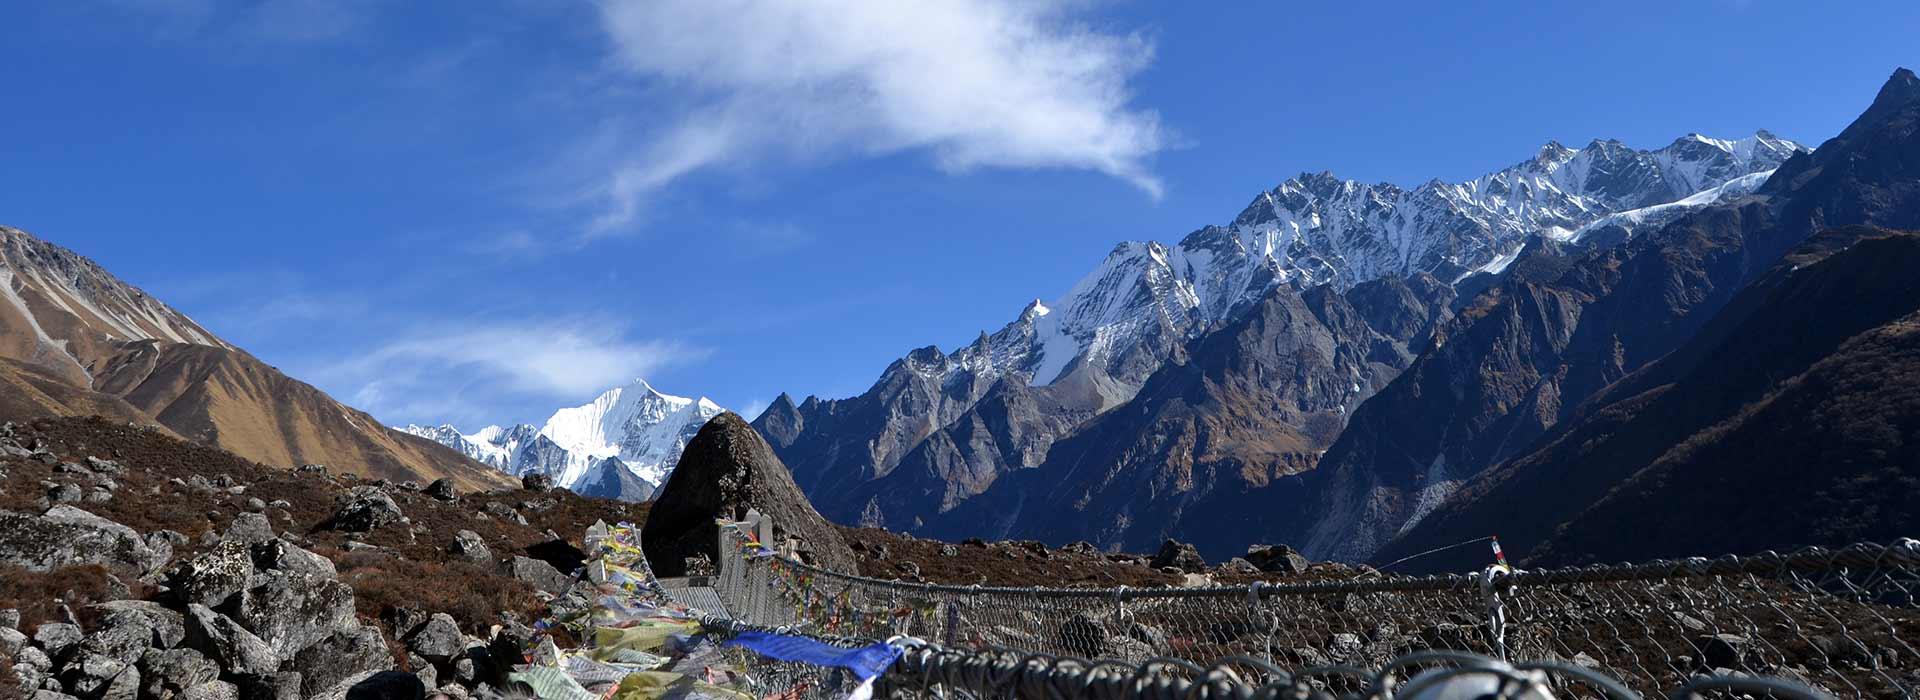 7 Days Langtang Valley Trek